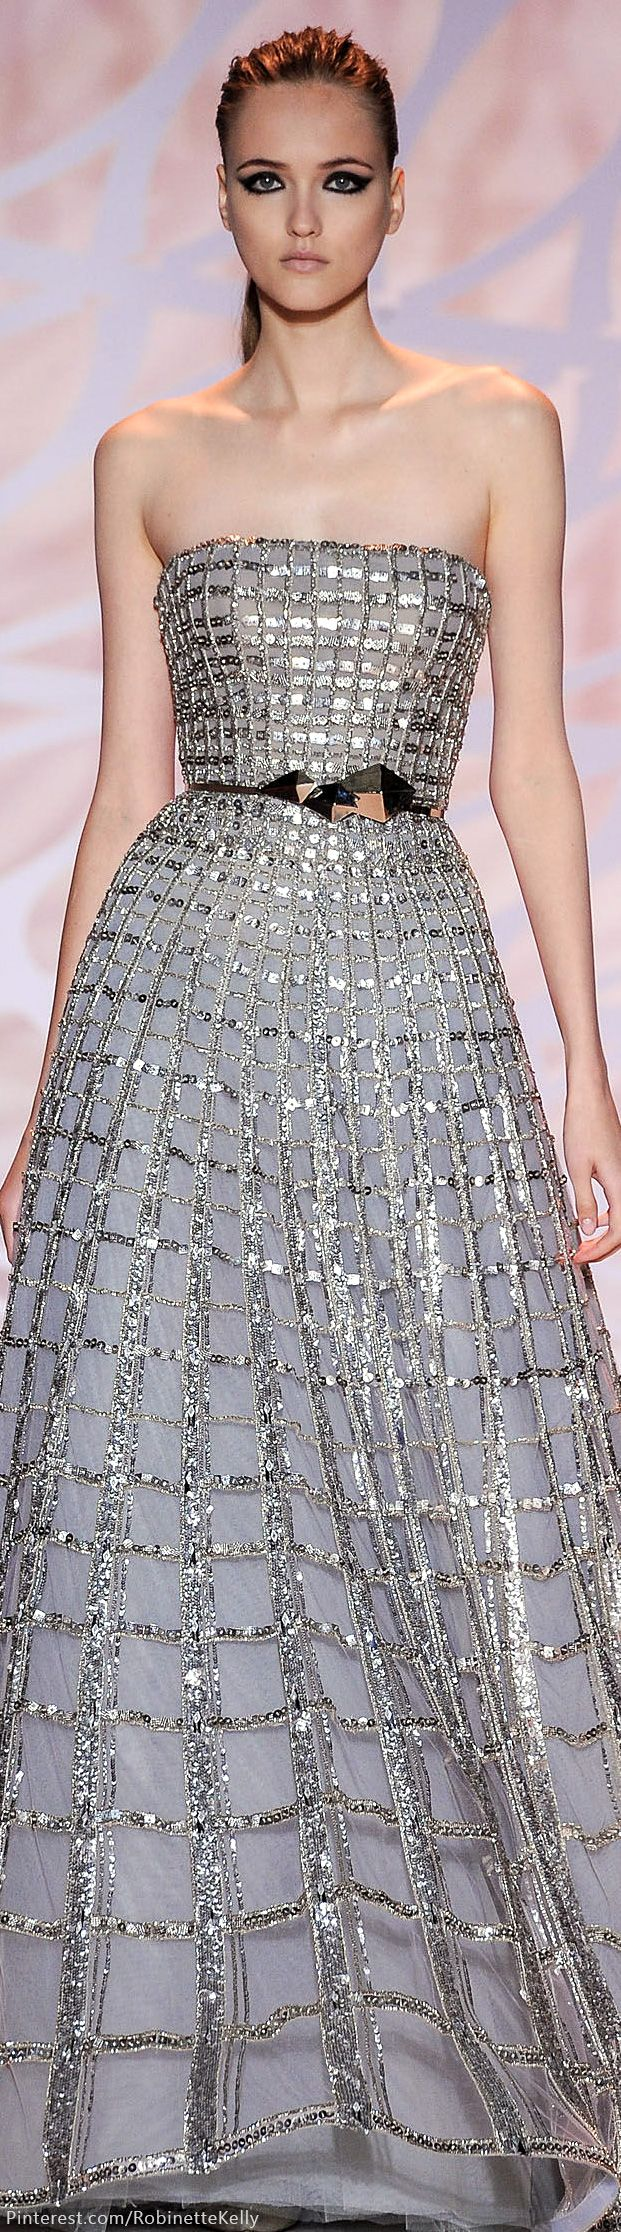 Gown by Zuhair Murad 2015